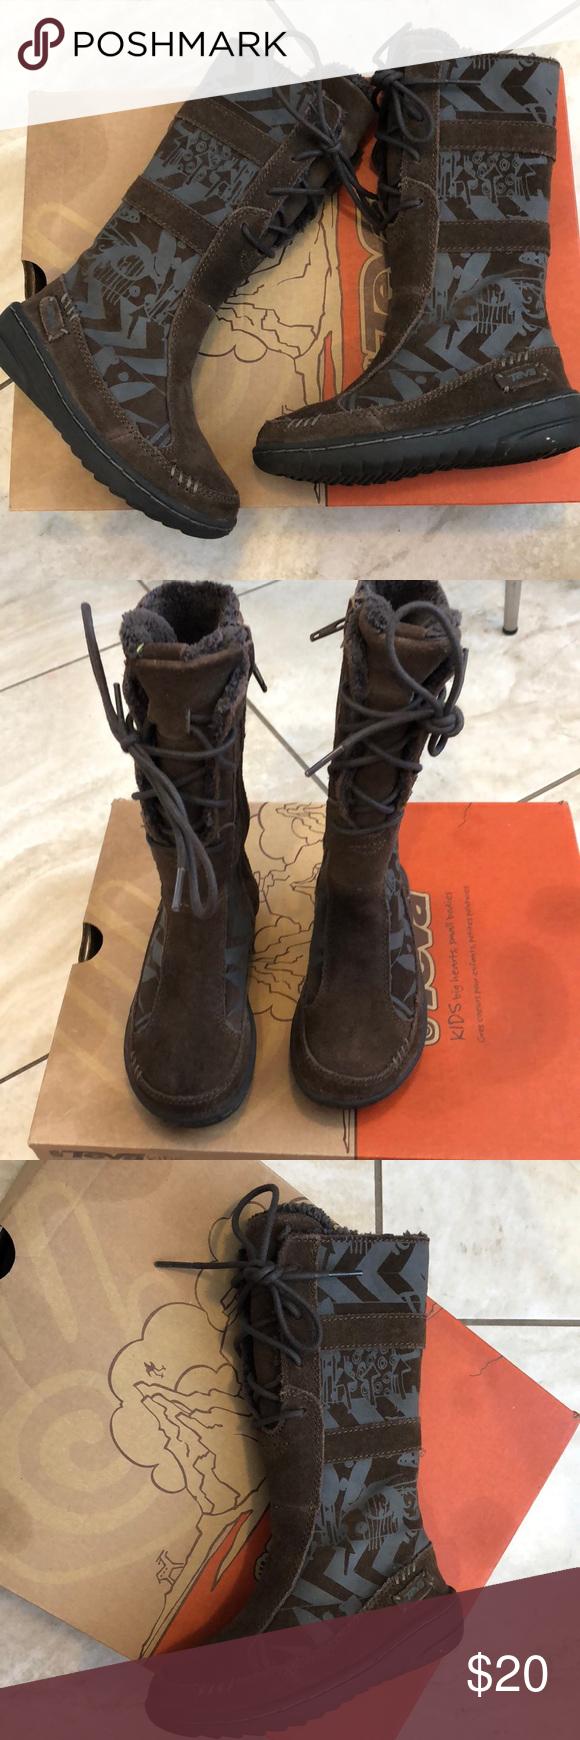 d3d3278927de77 Teva girls boots kiru print carafe sz 9 Size 9 Worn maybe twice Teva Shoes  Boots